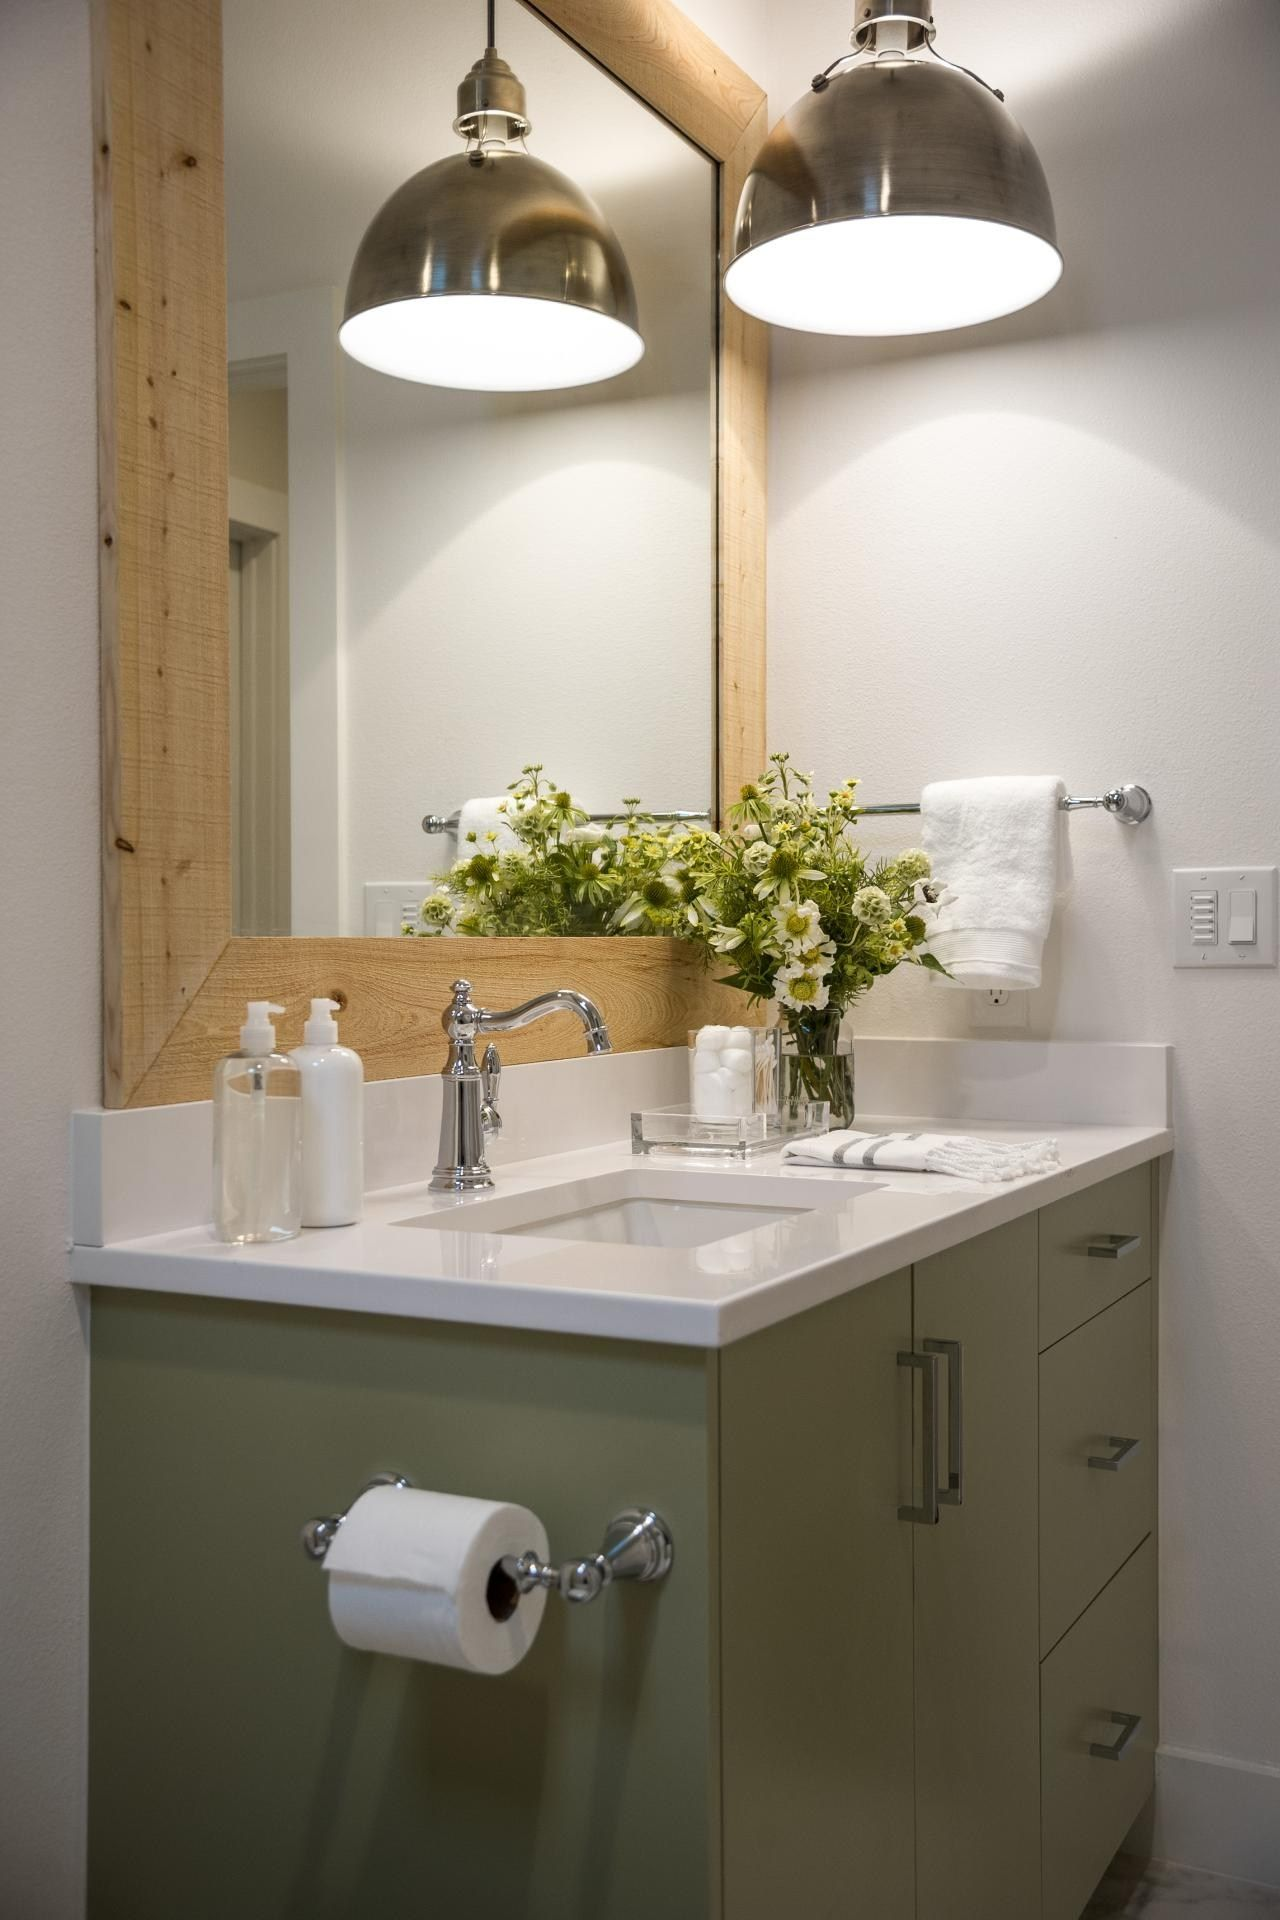 Interior Bathroom Vanity Lighting Ideas Light Fixtures Bathroom